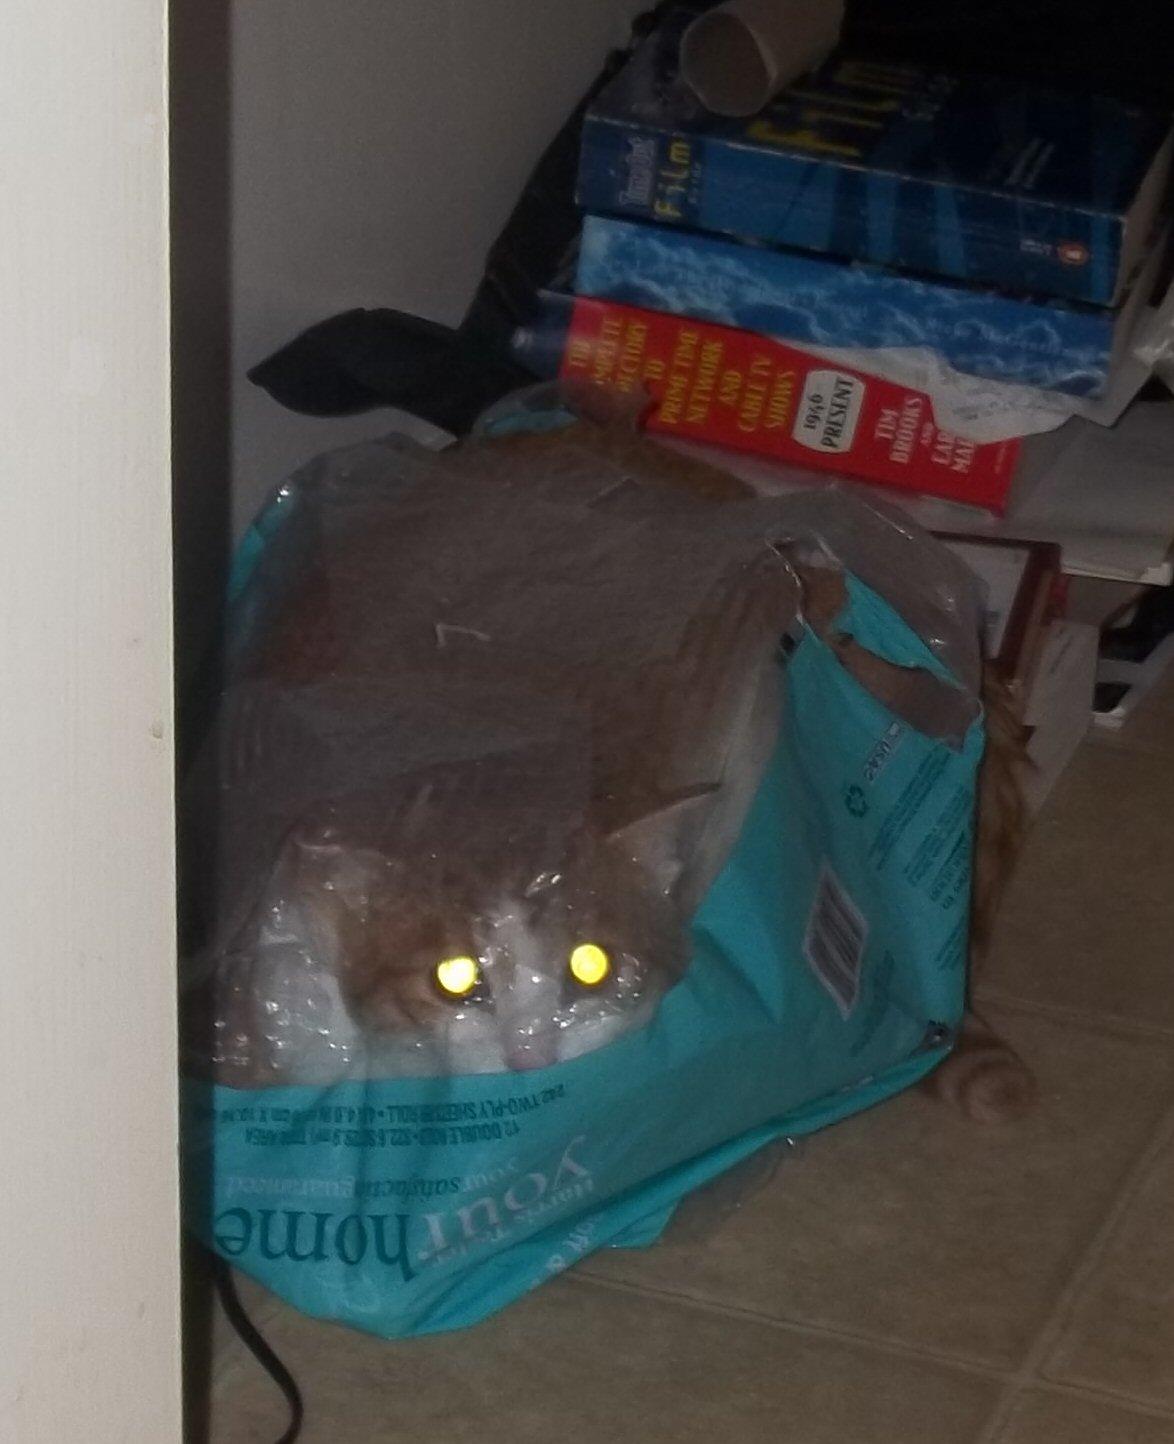 I stalking you!